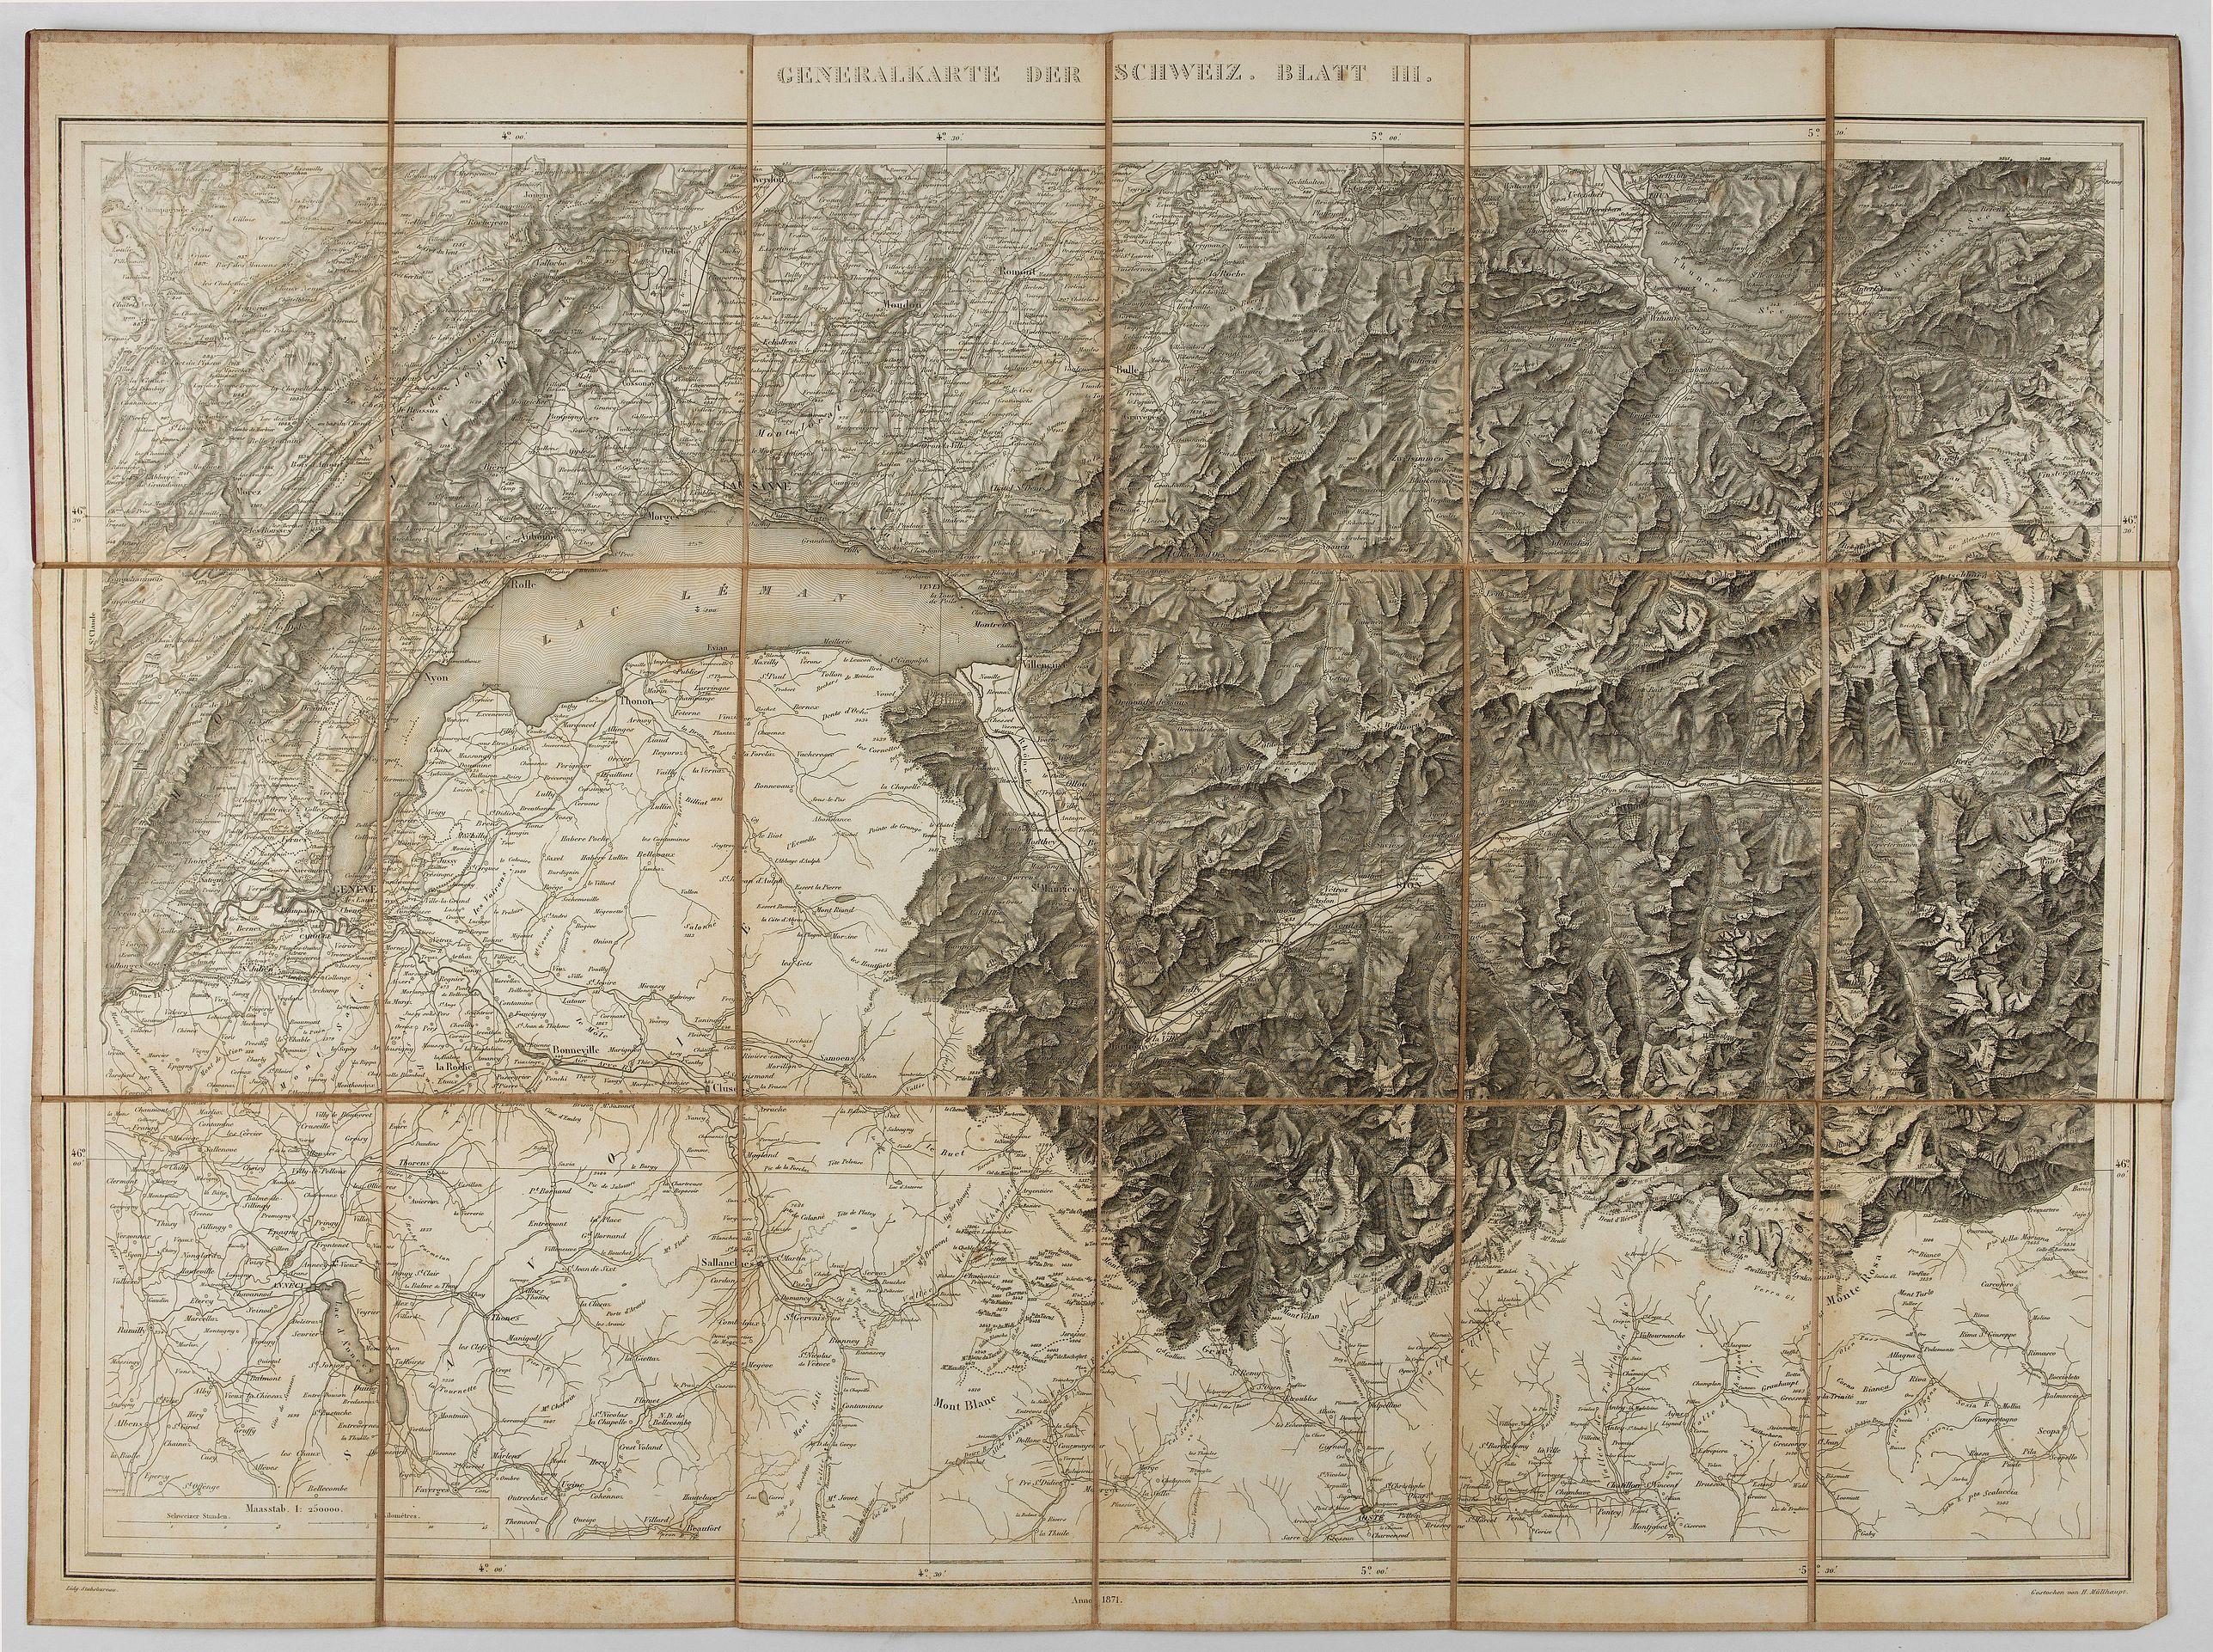 MULLHAUPT, H. -  Generalkarte der Schweiz. Blatt III.